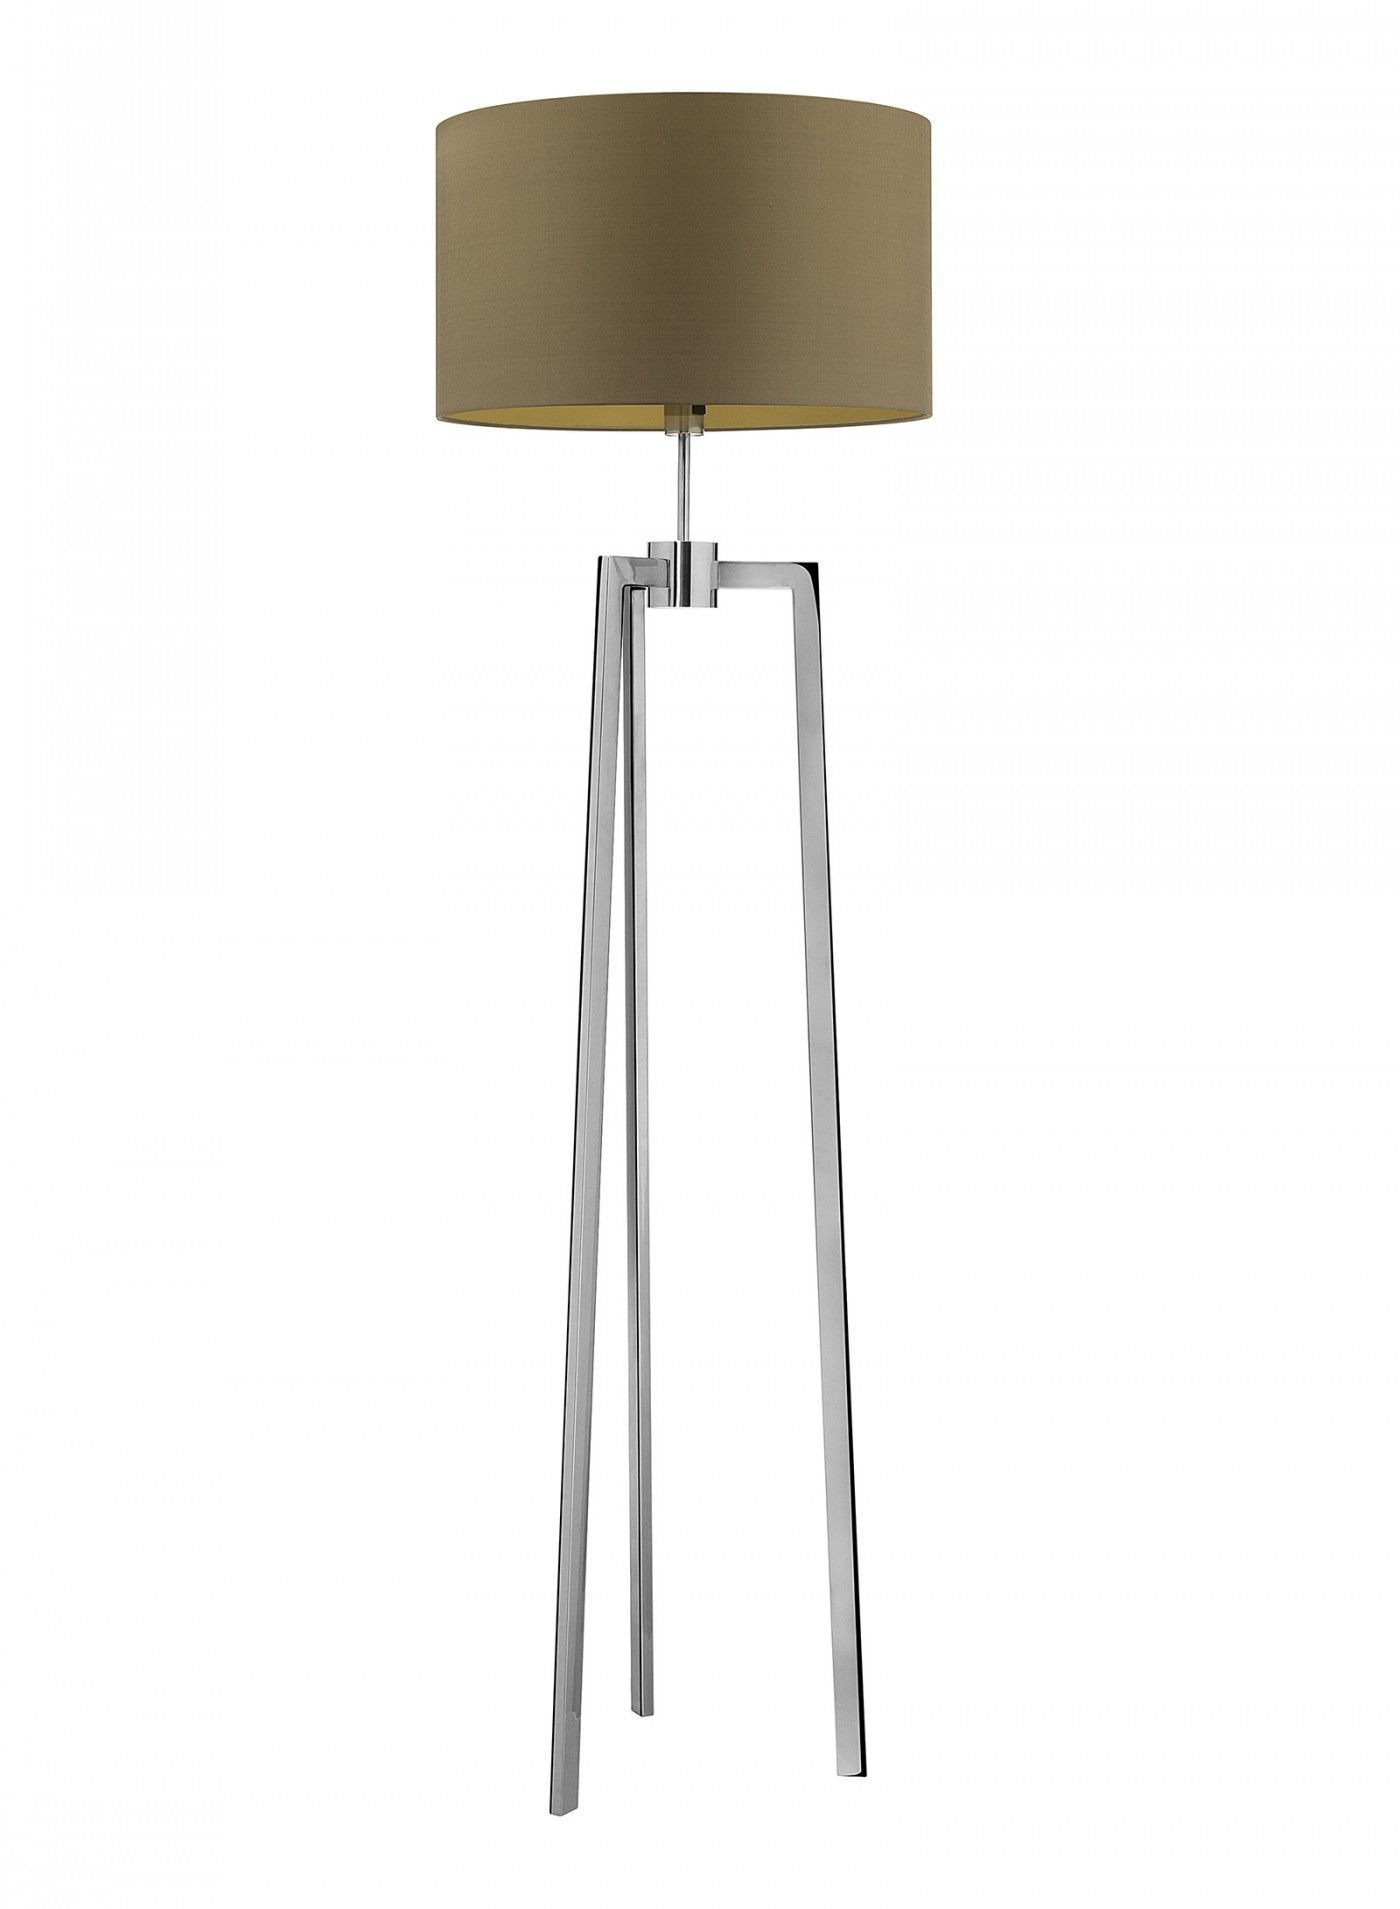 Picture of: Trianon Chrome Floor Lamp